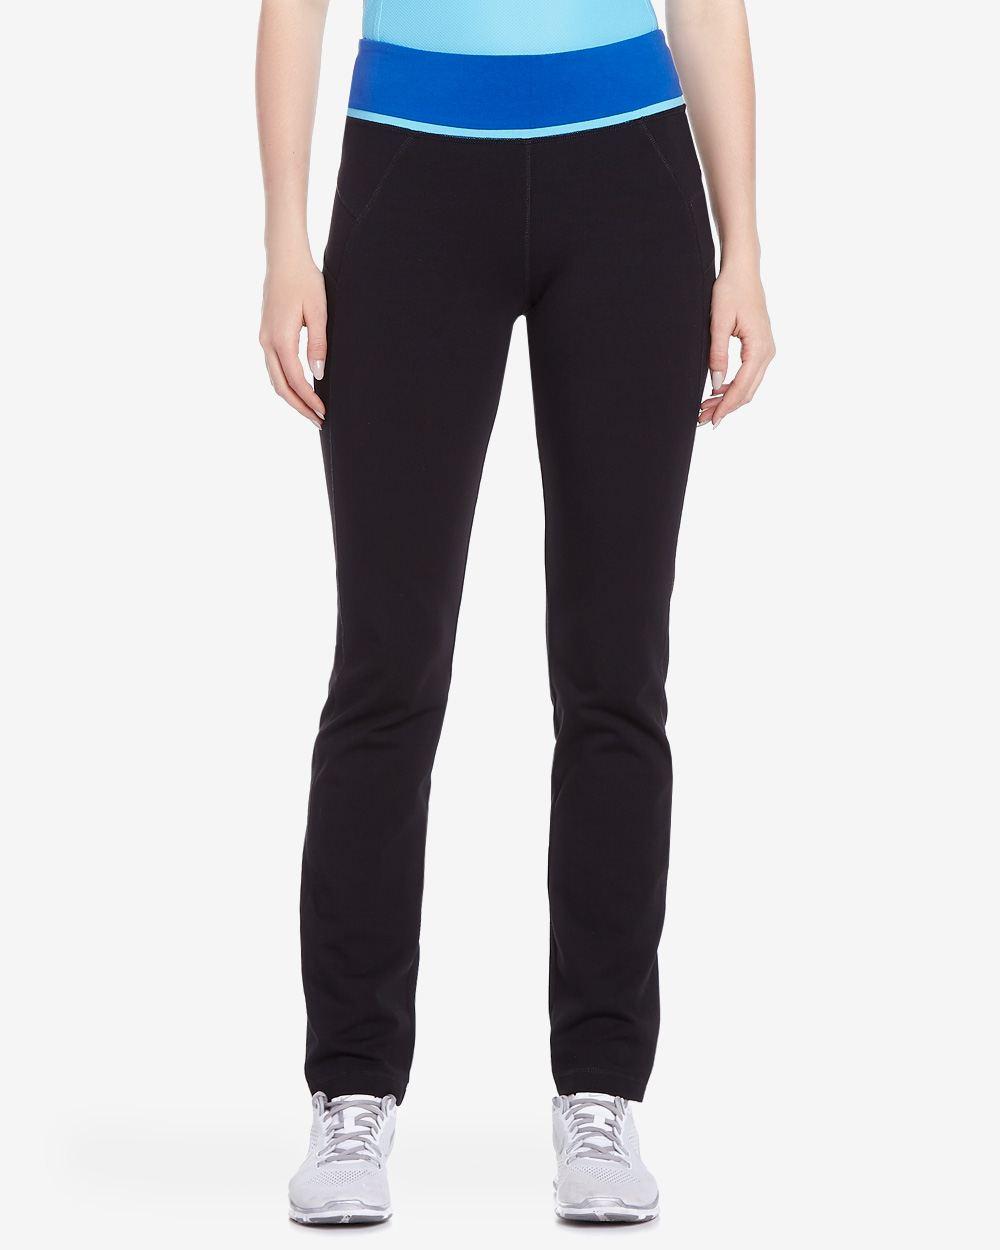 Hyba Colourblock Yoga Pant